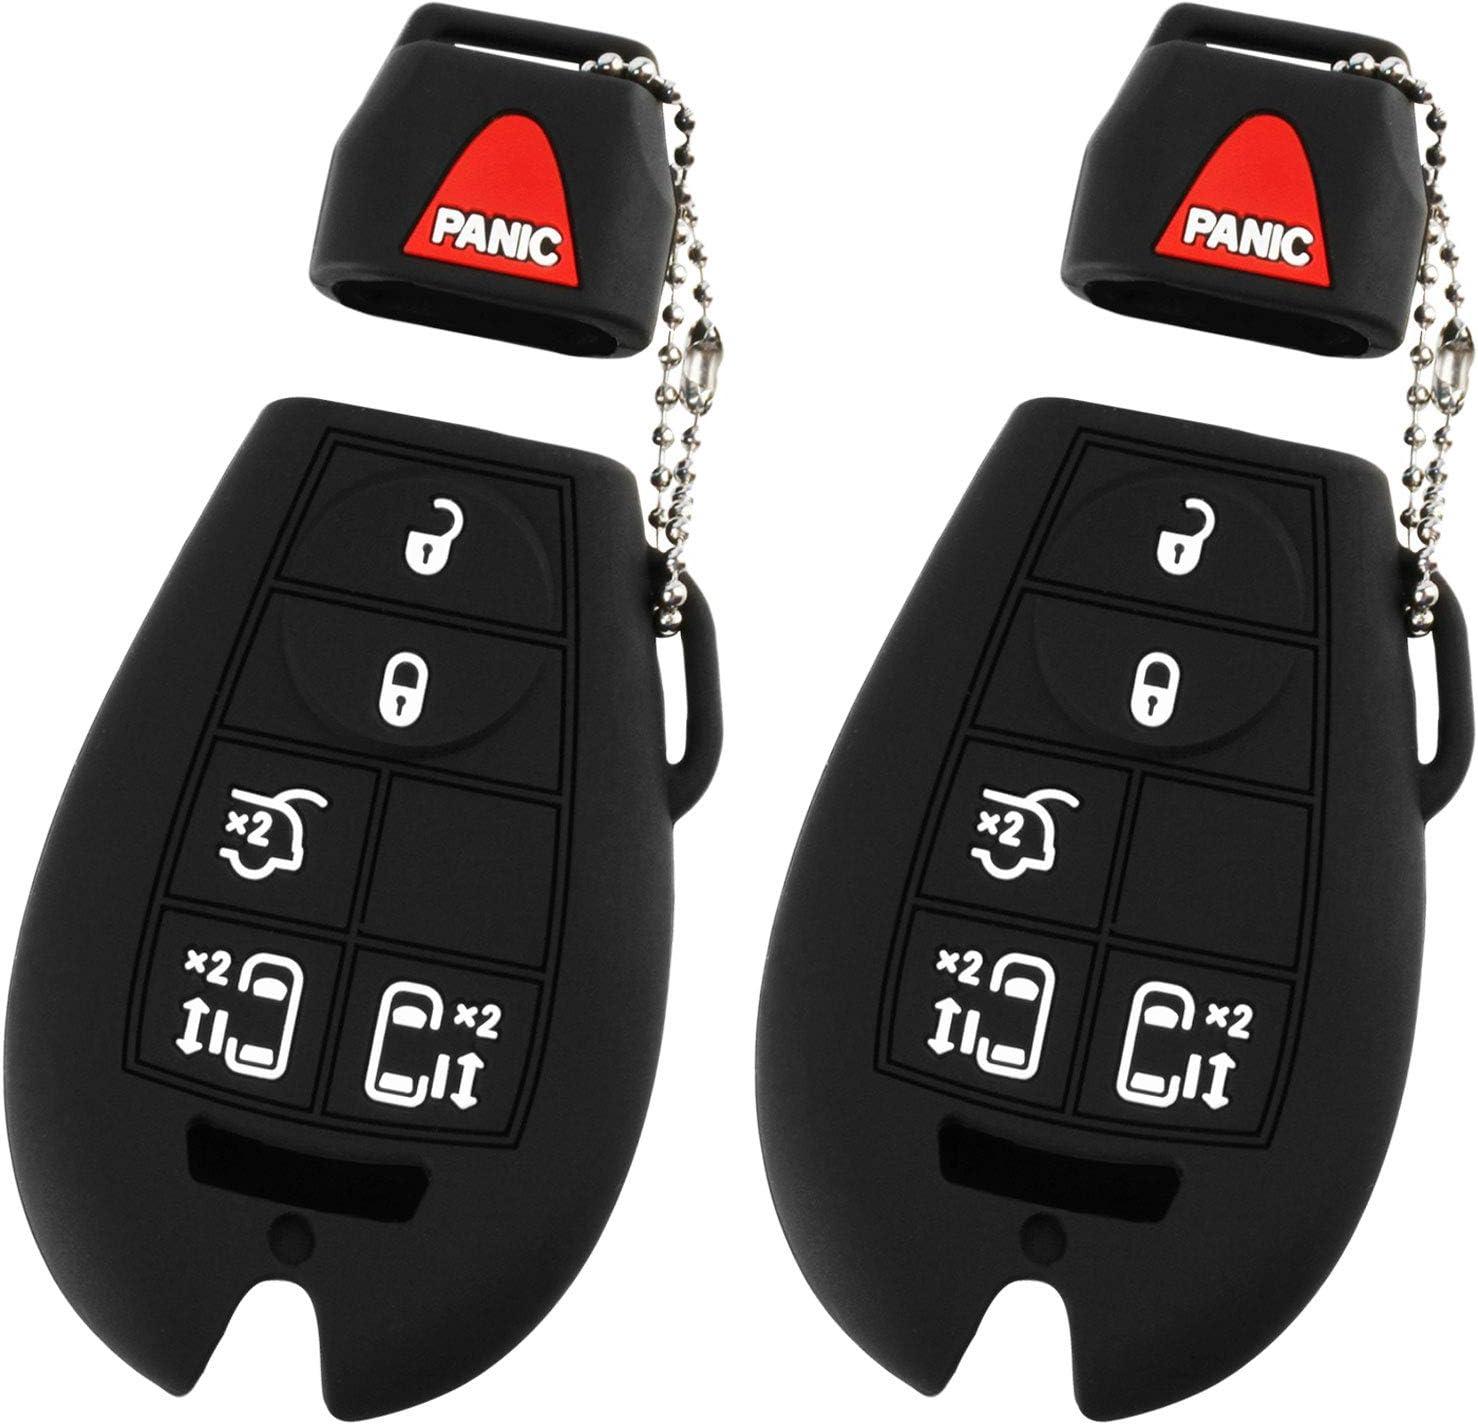 Key Fob Keyless Entry Remote Cover Protector for Jeep Dodge Chrysler M3N5WY783X, IYZ-C01C, Fobik